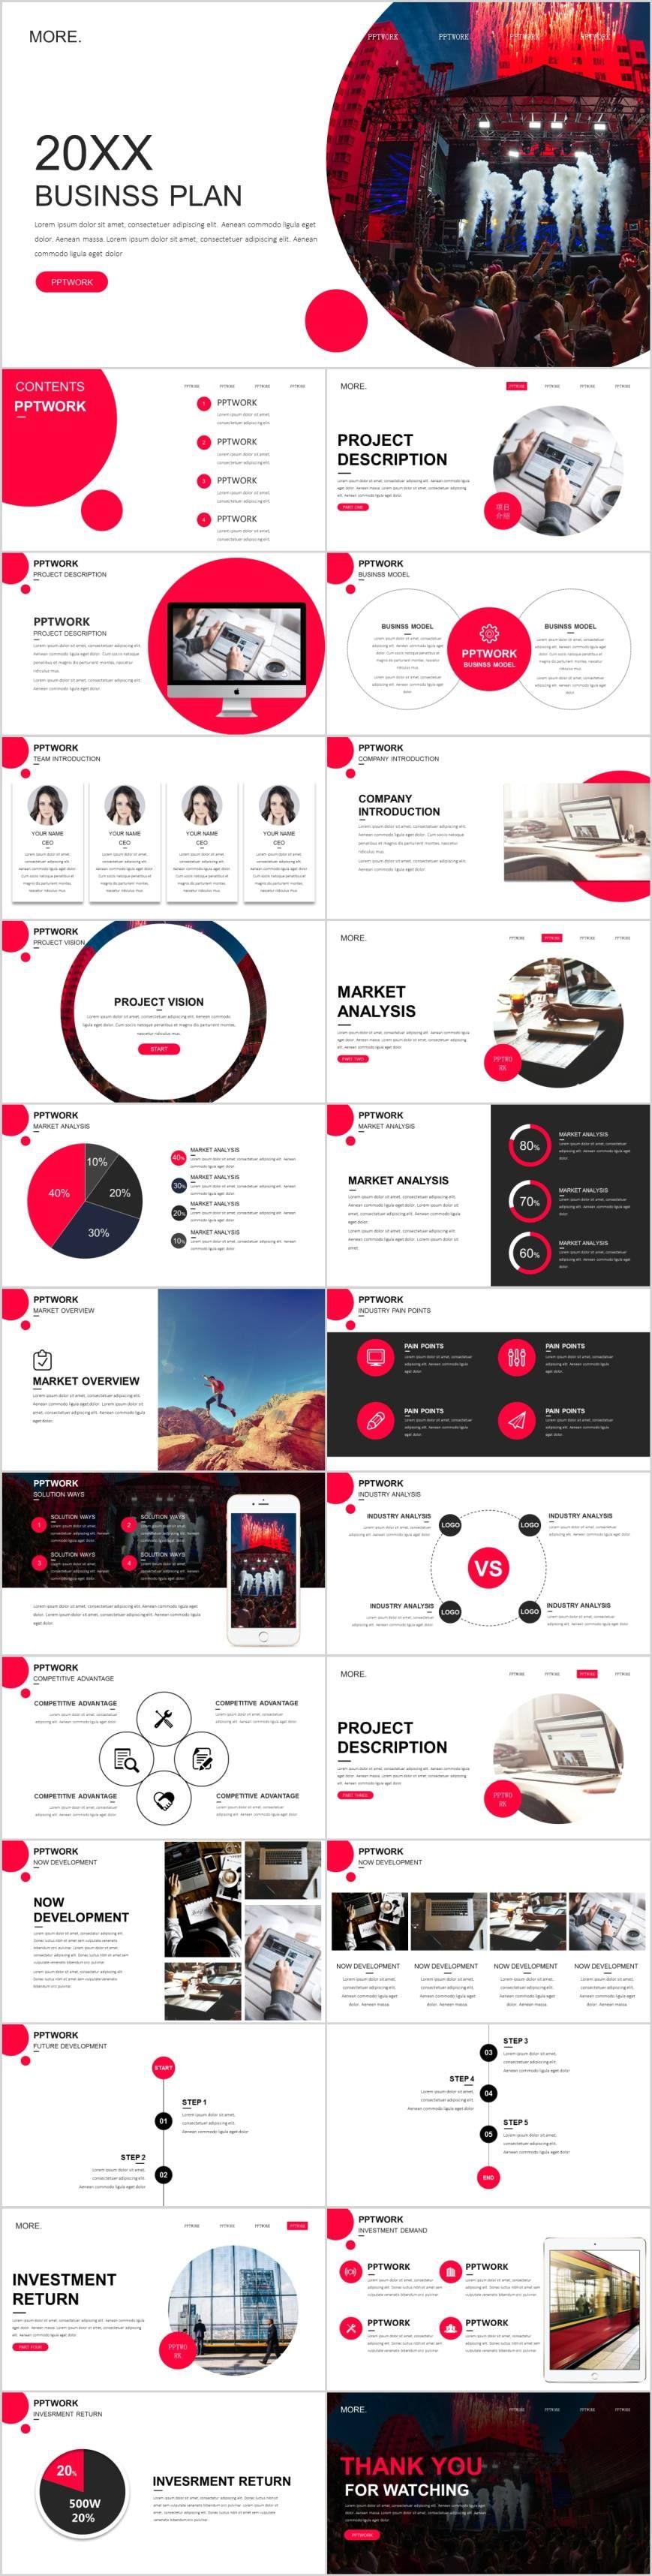 Red website plan PowerPoint template--Pcslide.com- #Presentation #PowerPoint #design #art #infographic #chart #report #business #templates